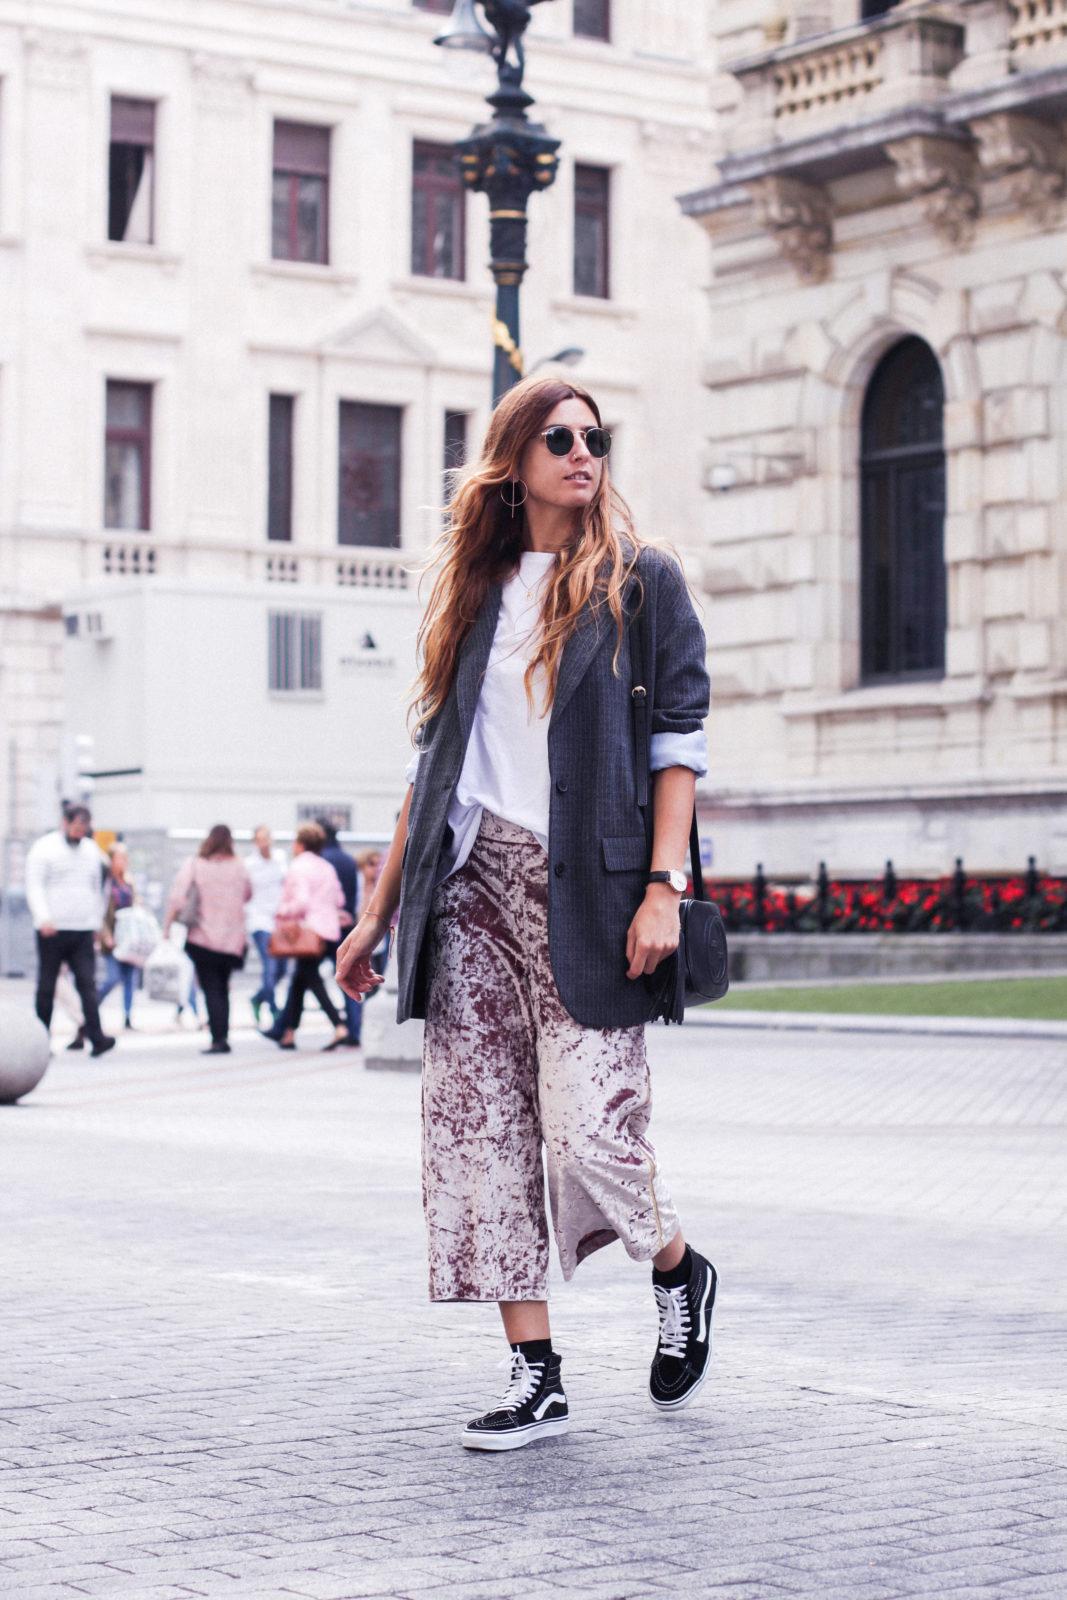 pantalones_terciopelo_rosa_pull_and_bear_blazer_vans_pendientes_aros_gucci-42